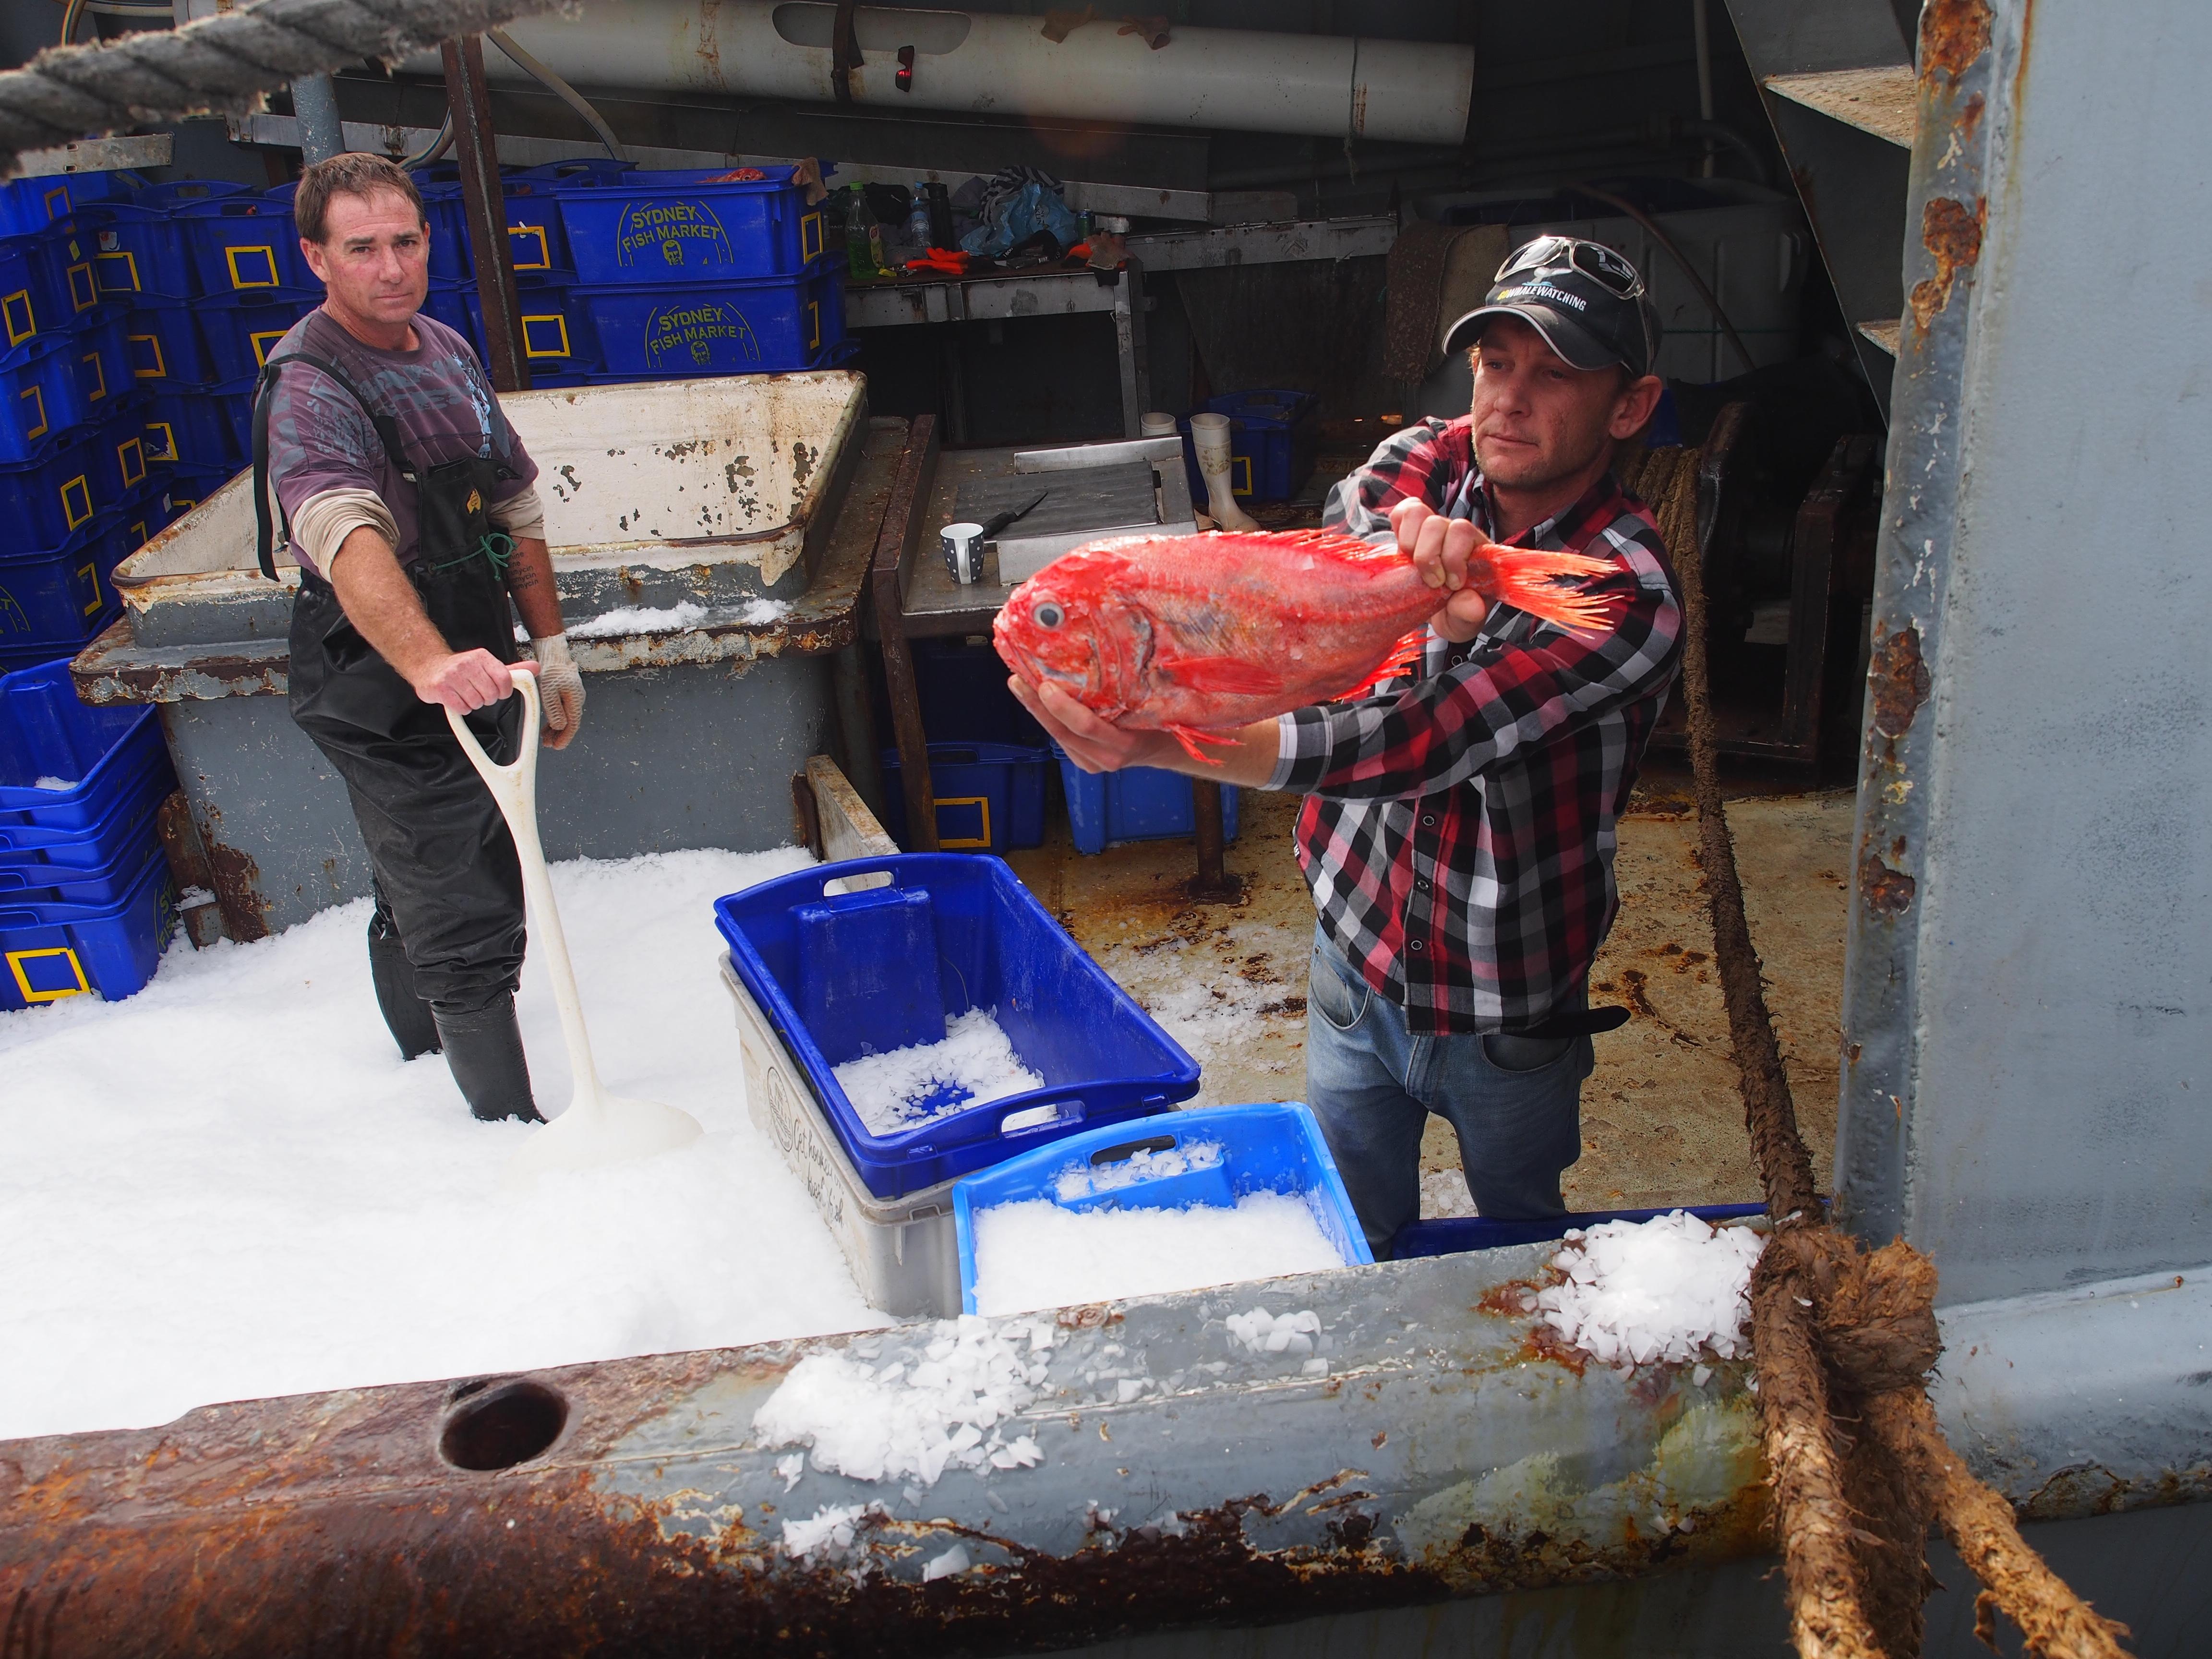 Eden fisherman with orange roughie fish NSW